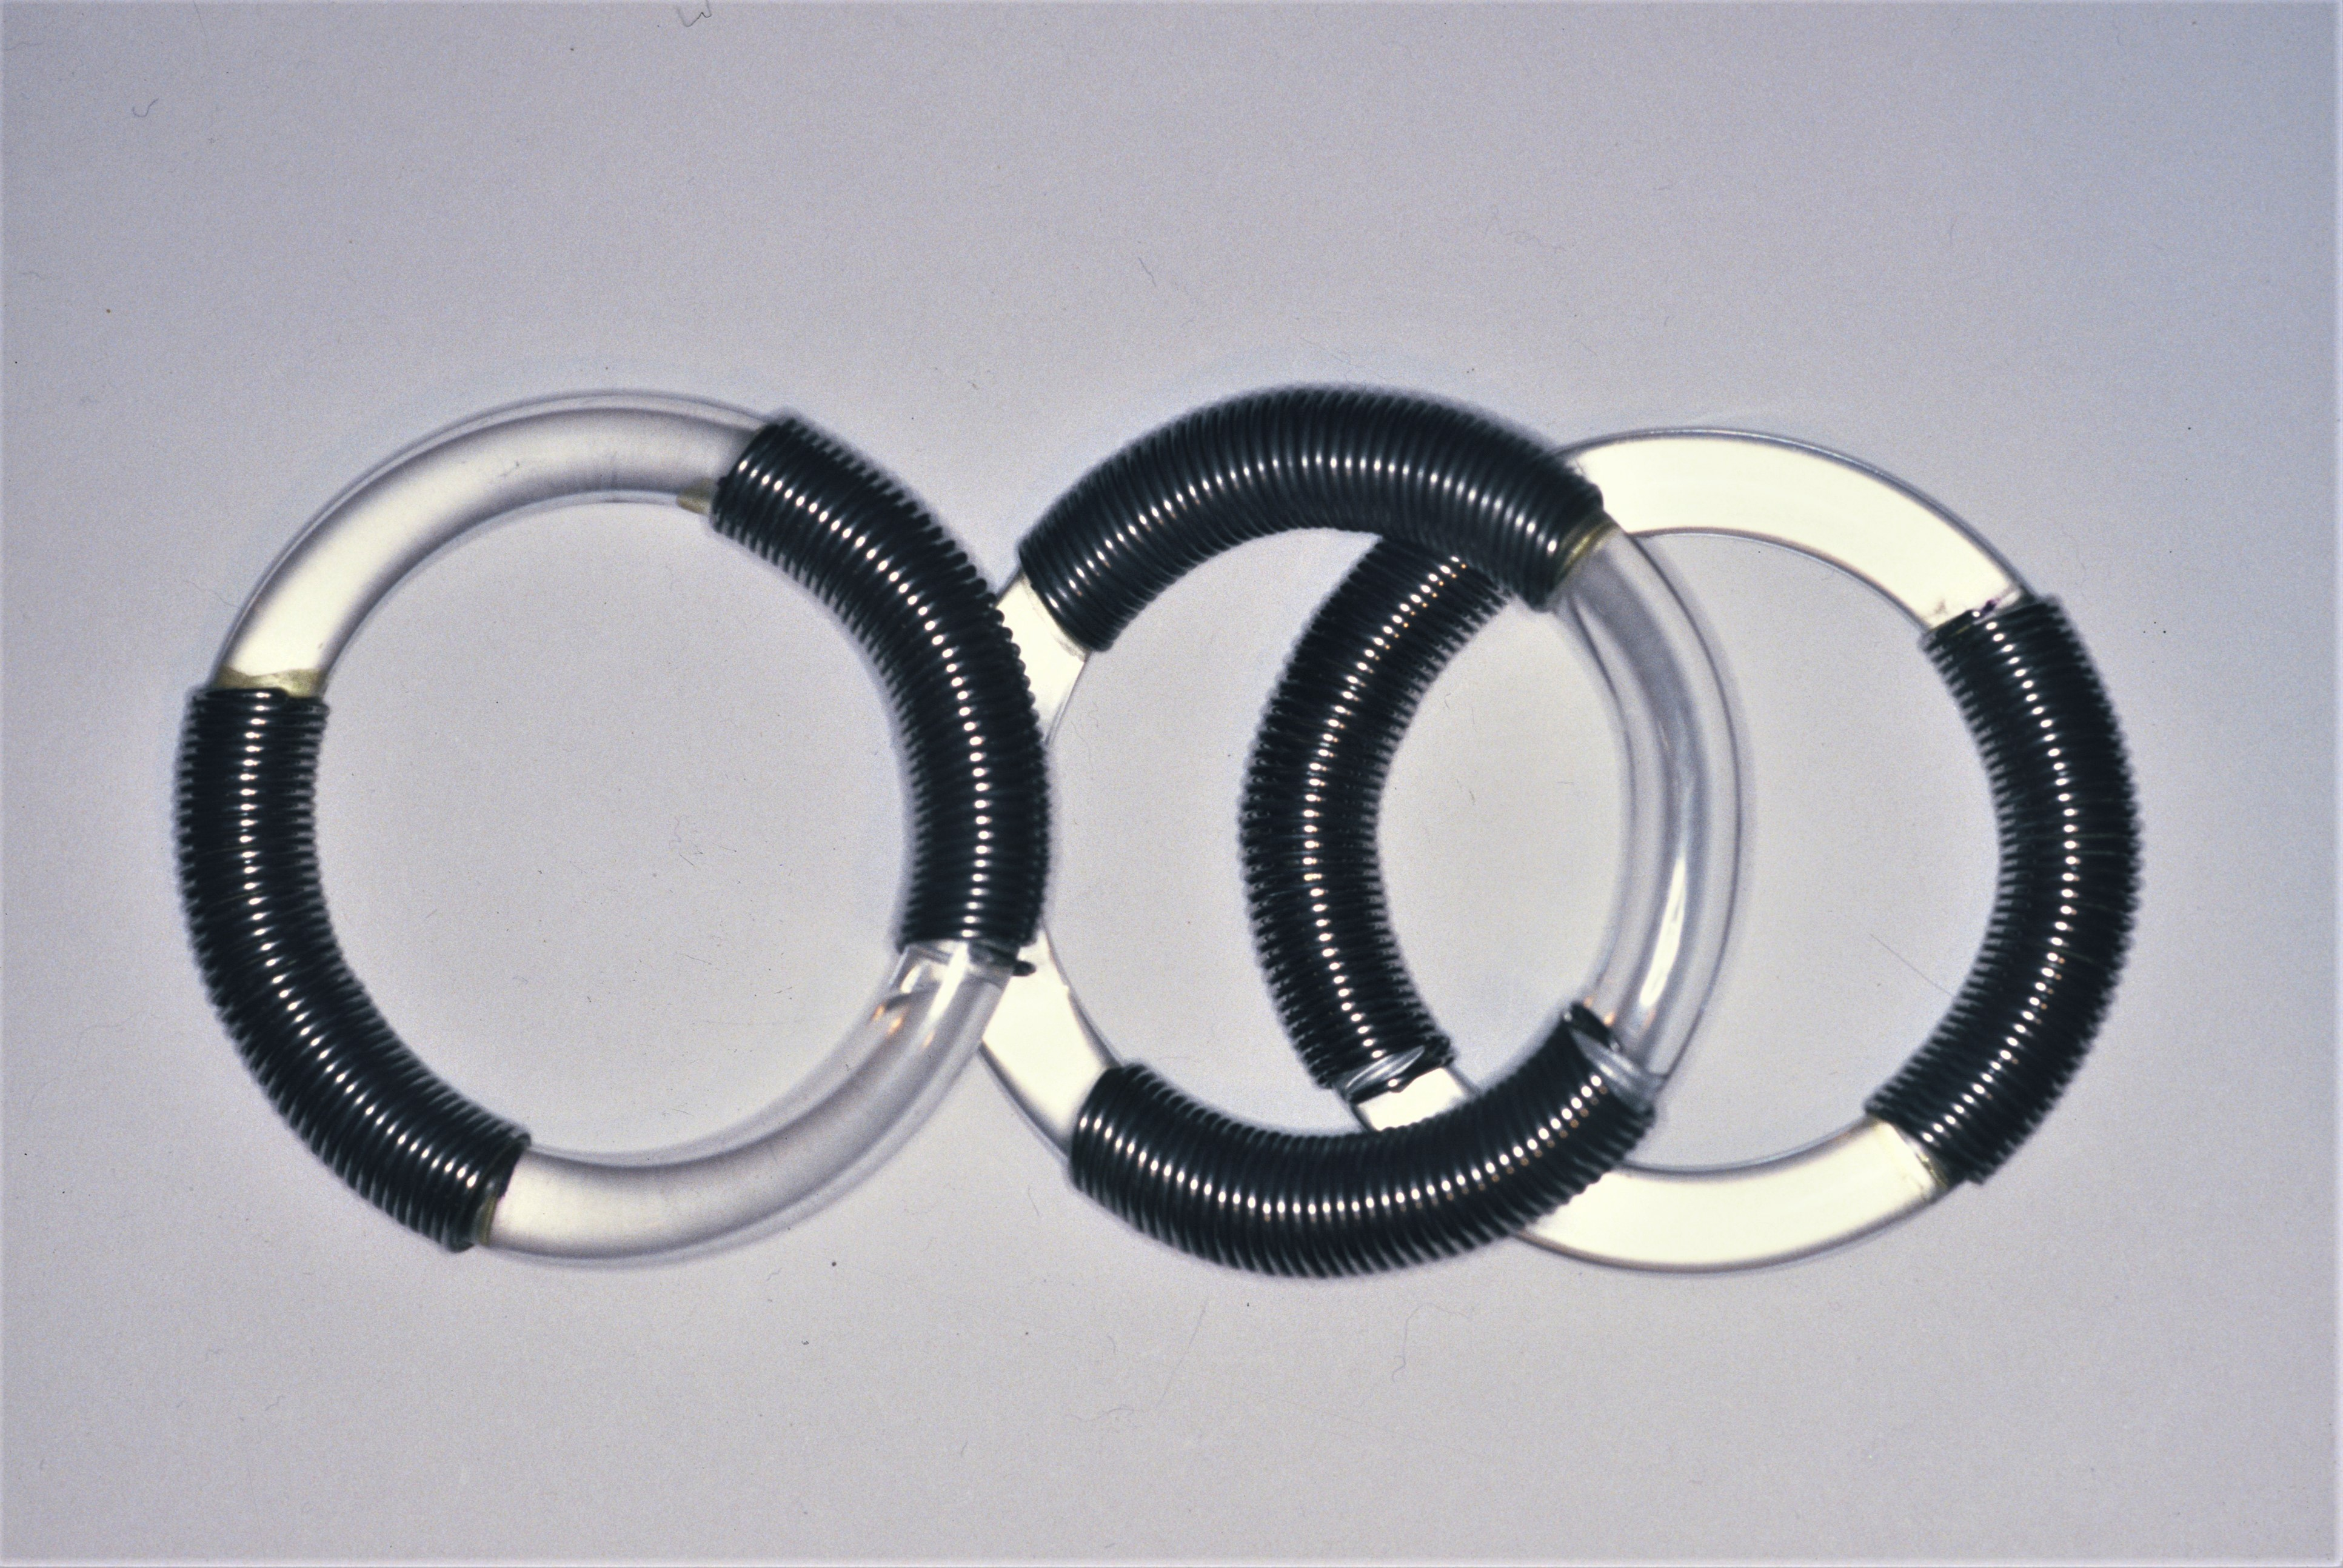 Lous Martin, armbanden Serie Sieraad, 1973, roestvrij staal, acrylaat